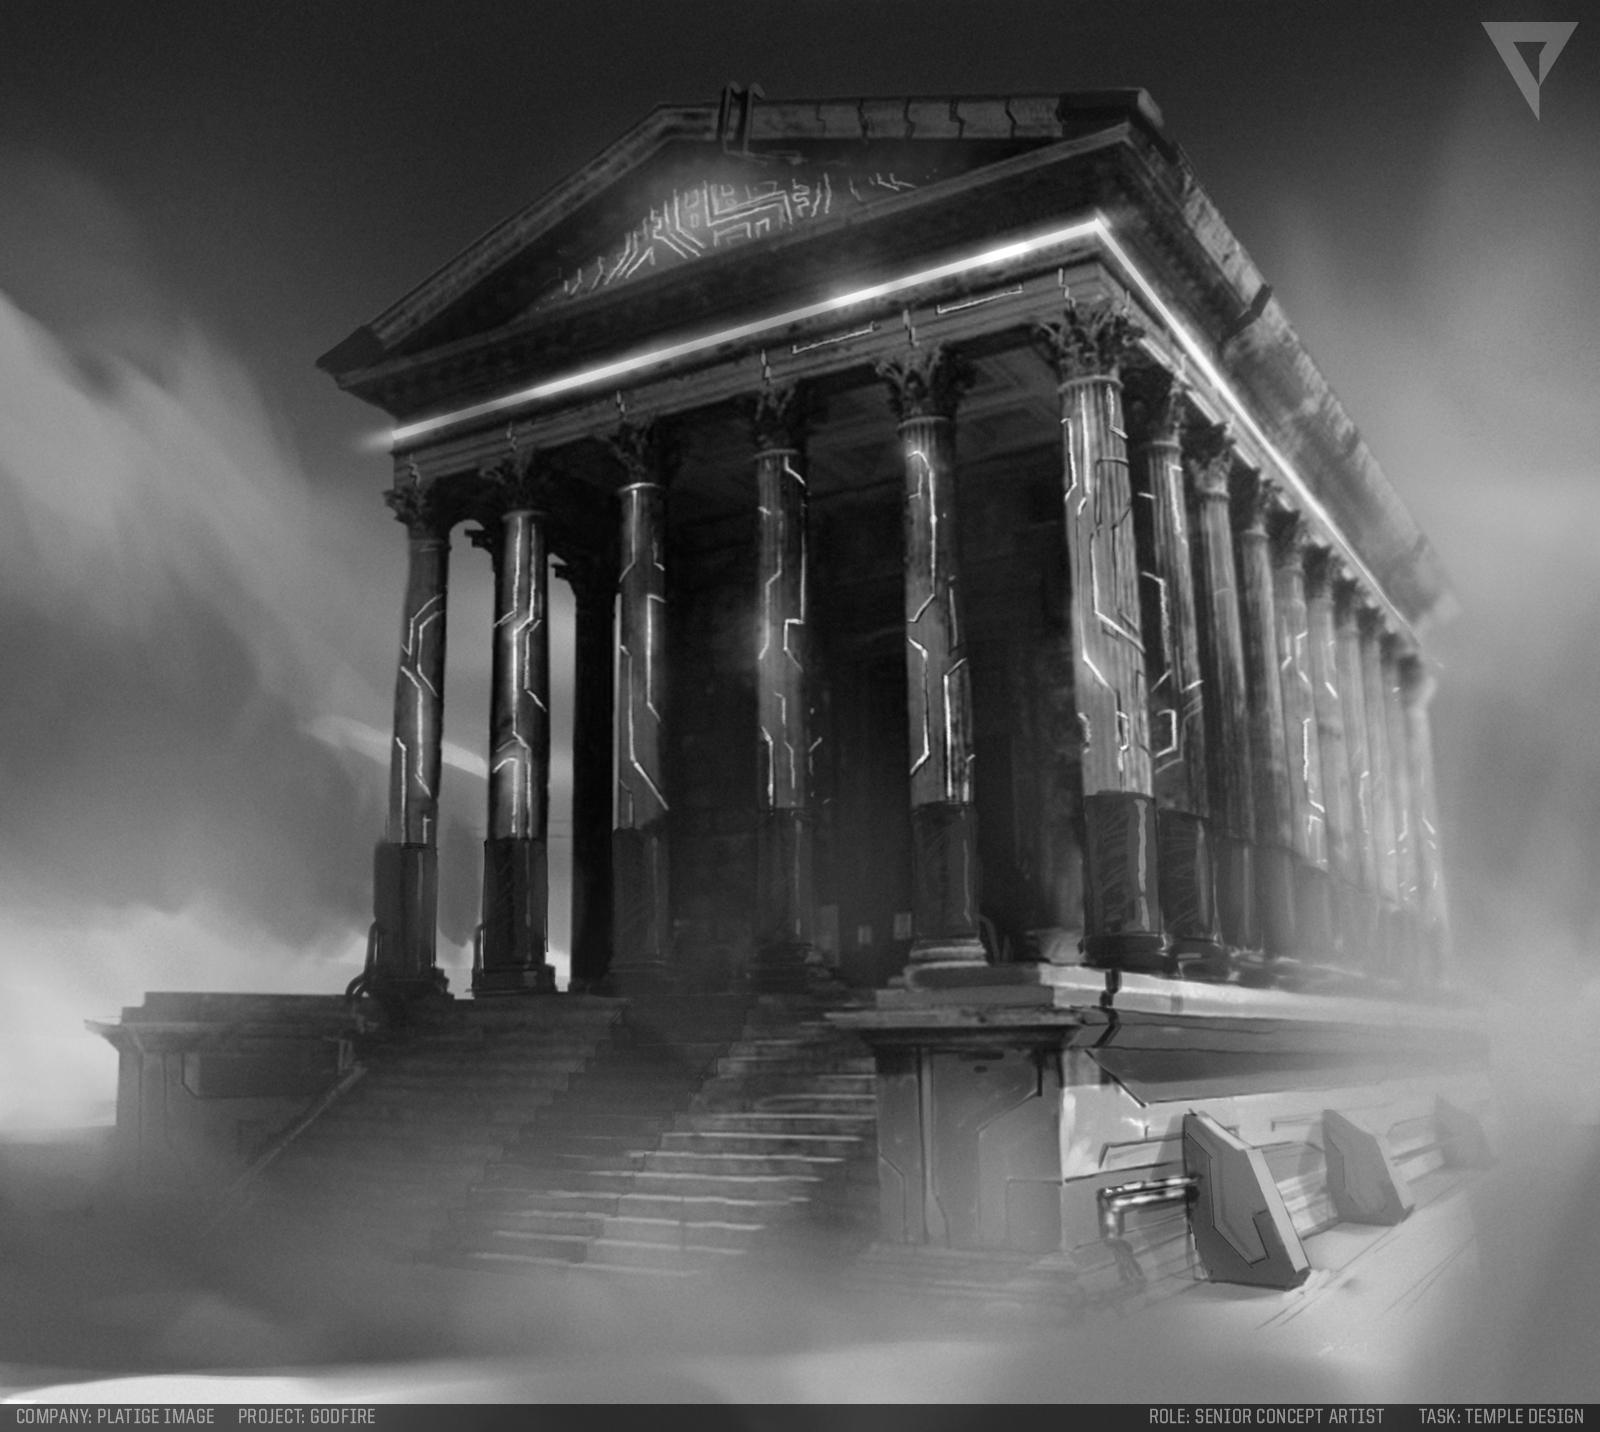 temple_detail_building 2_folio.jpg